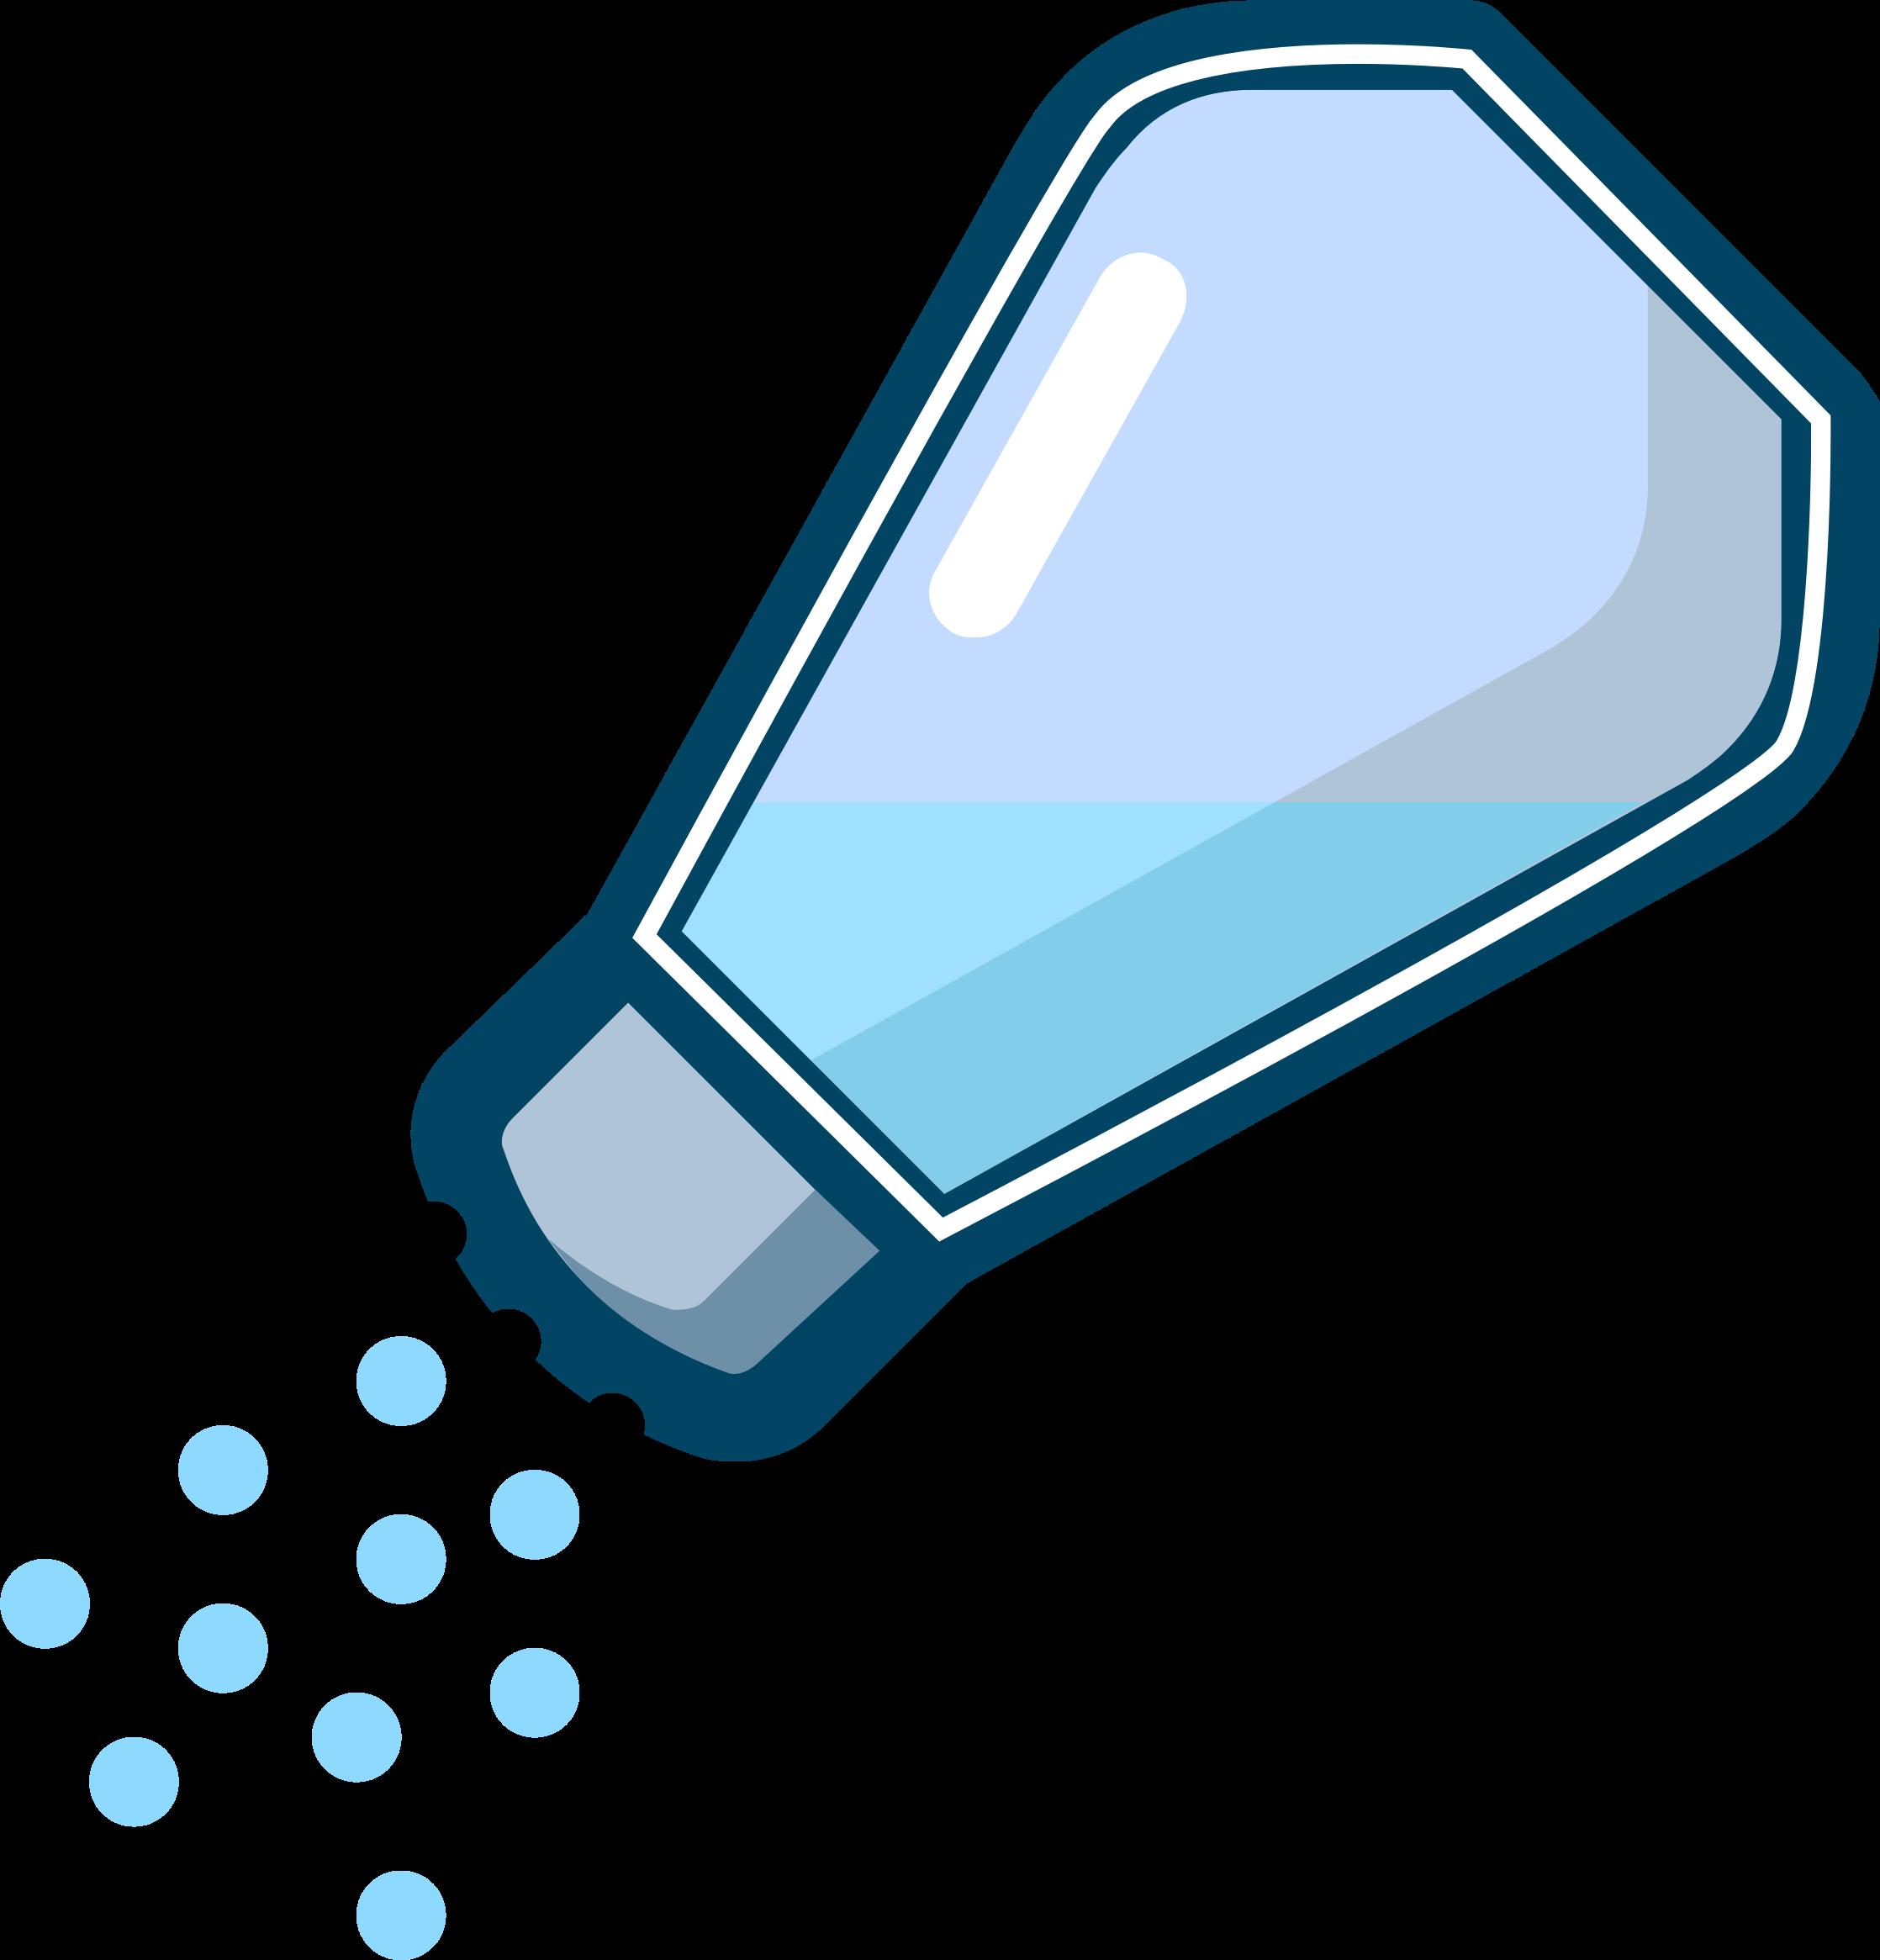 salt shaker by cactus cowboy